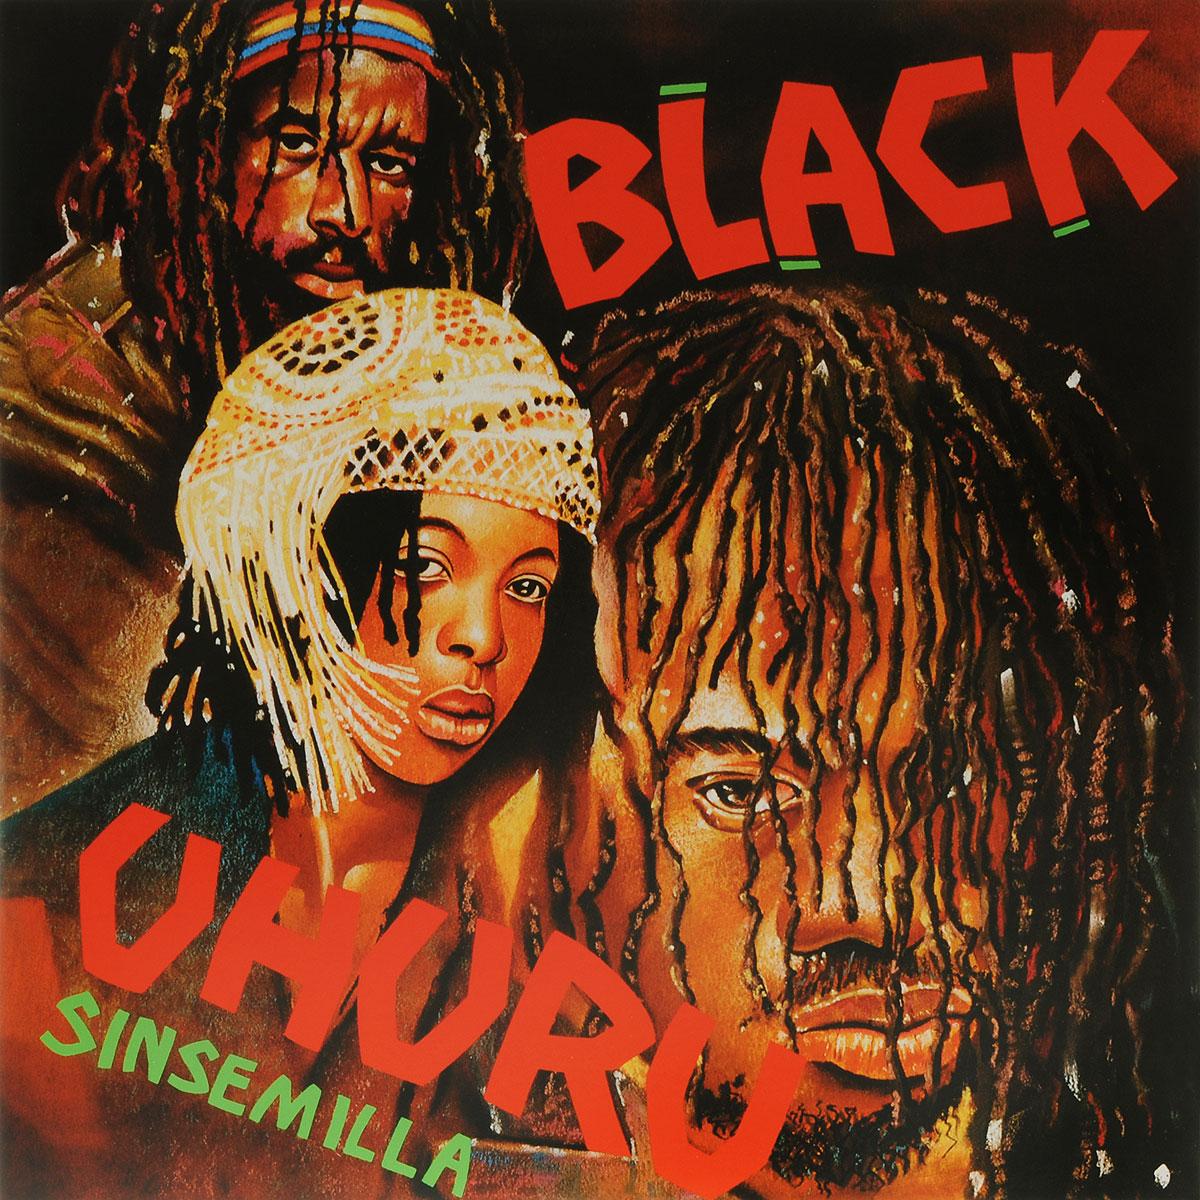 Black Uhuru Black Uhuru. Sinsemilla (LP) защитная пленка lp универсальная 2 8 матовая